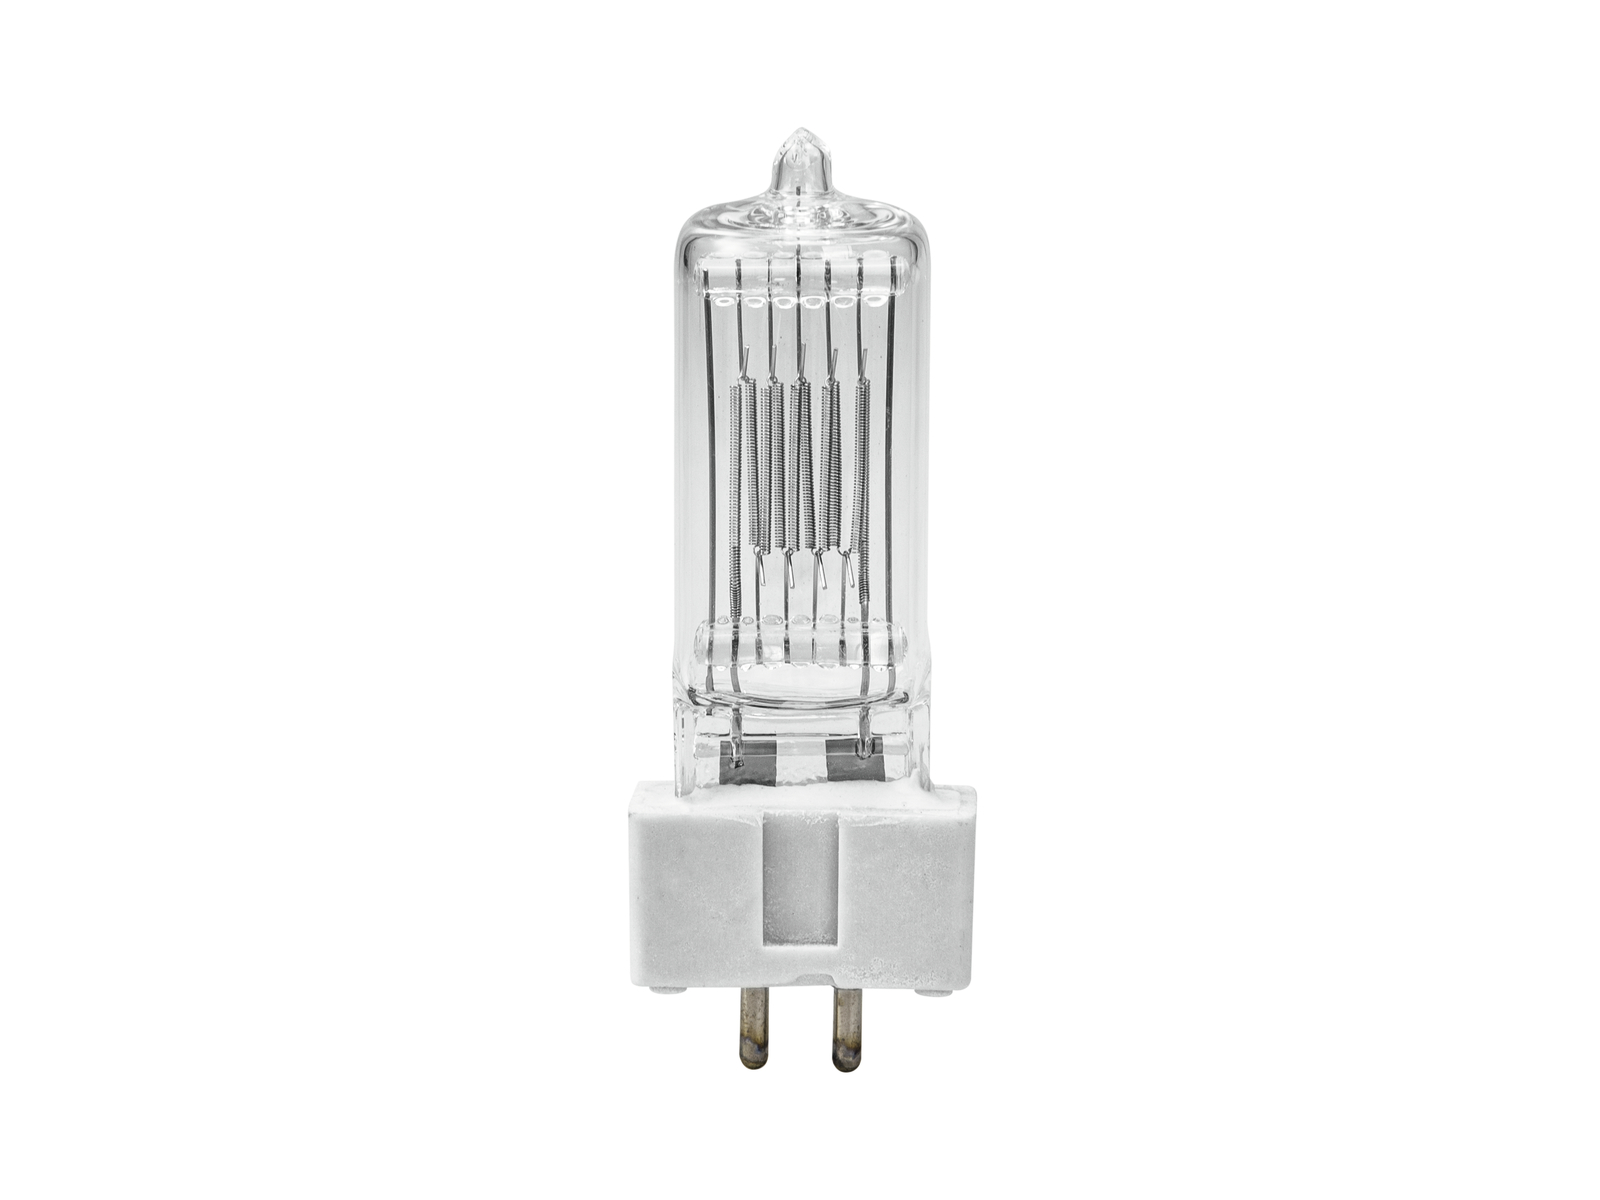 230V/1000W GY-9.5 200h 3200K Omnilux